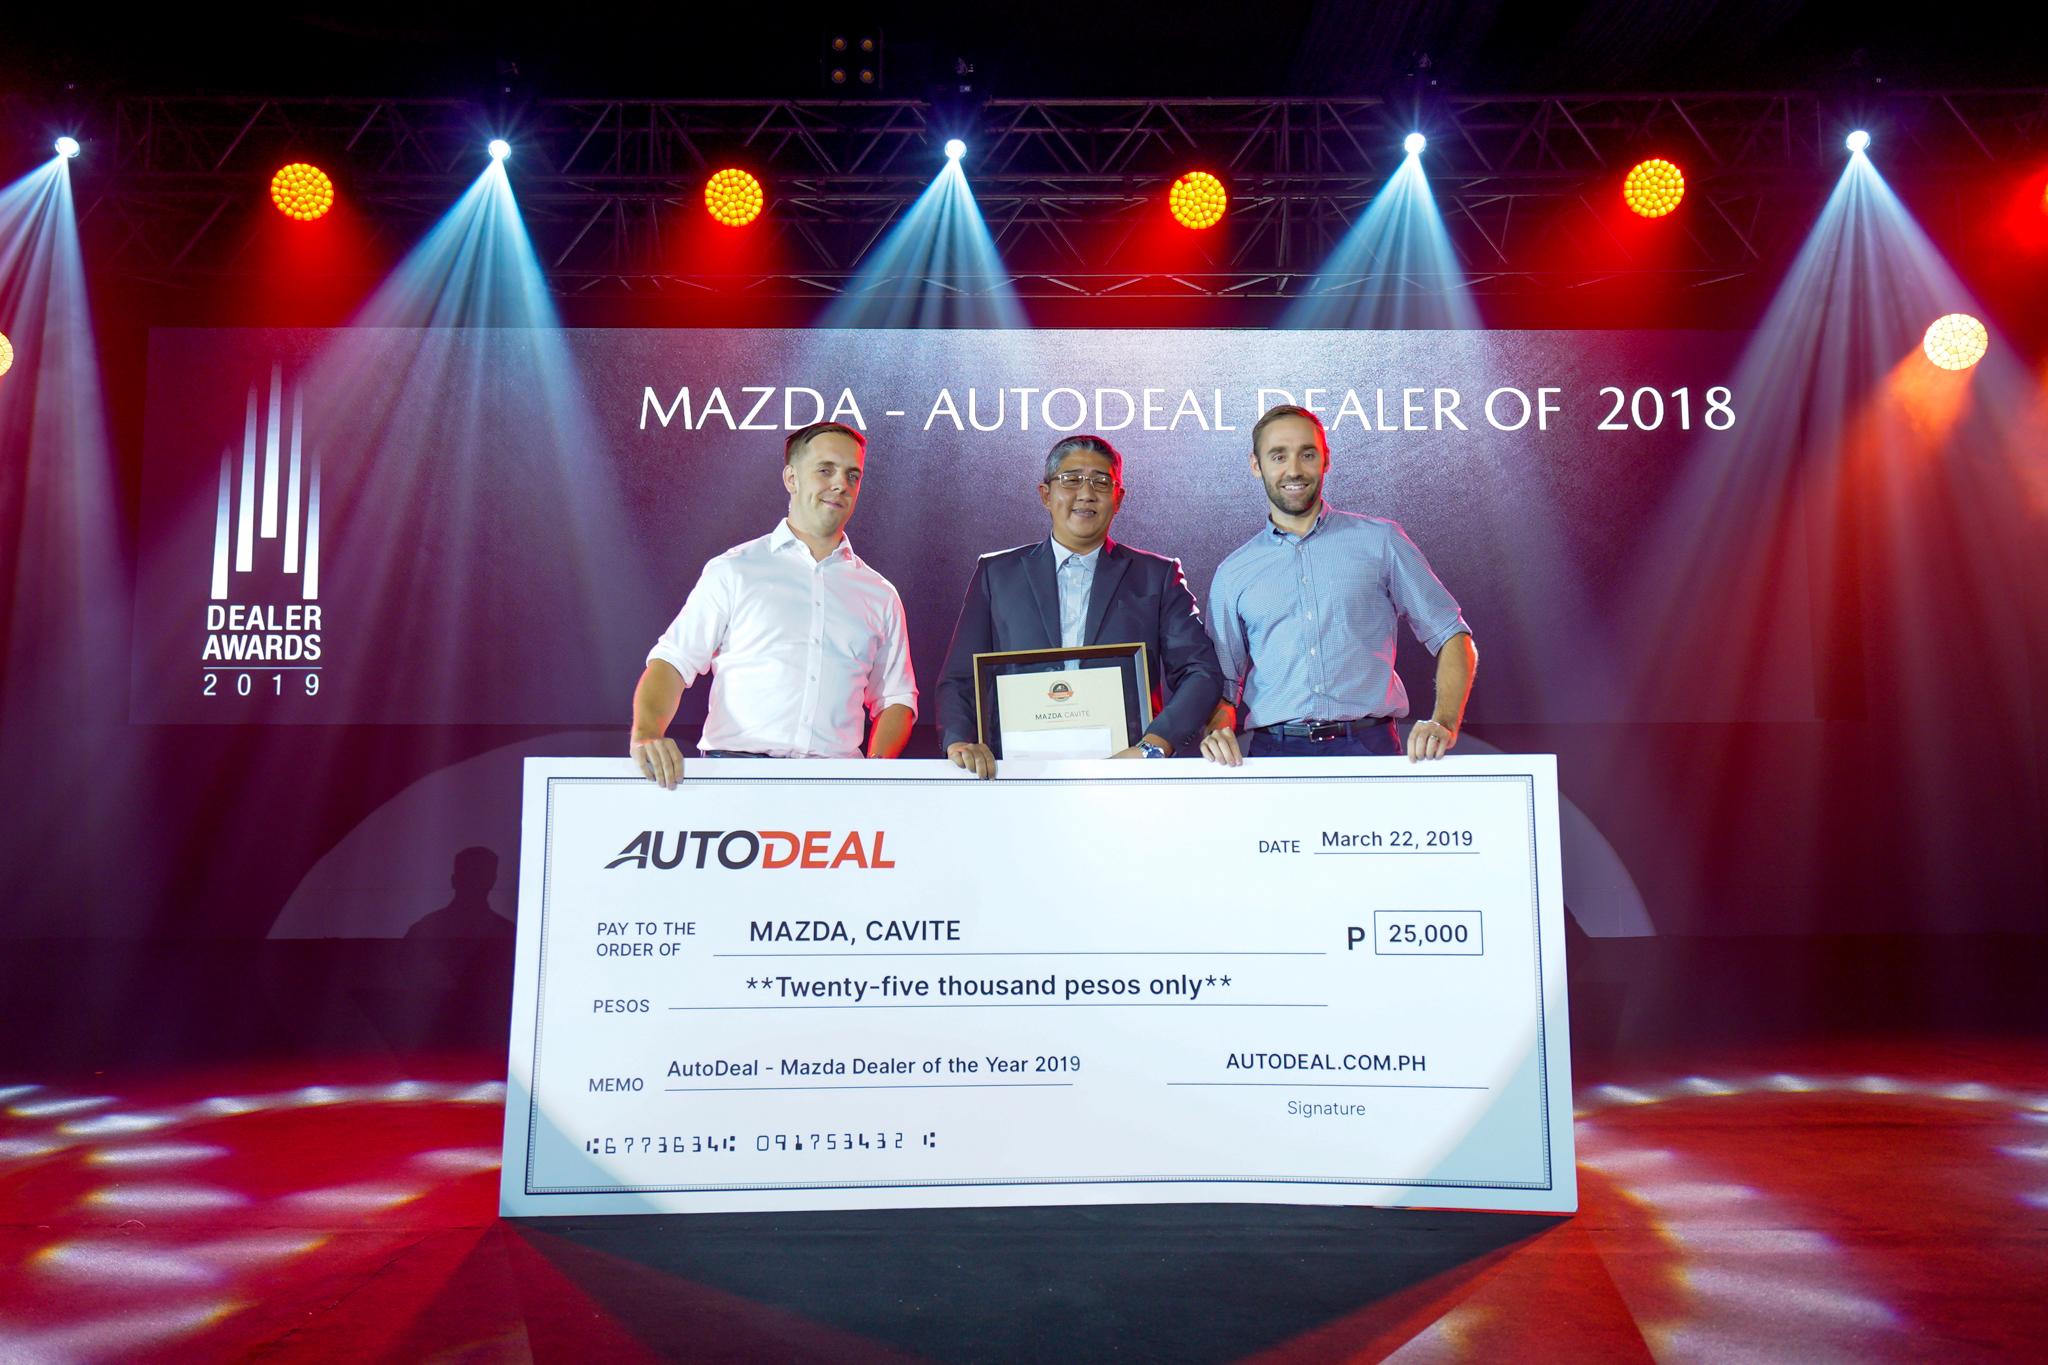 Mazda Cavite - Mazda AutoDeal Dealer of the Year 2018